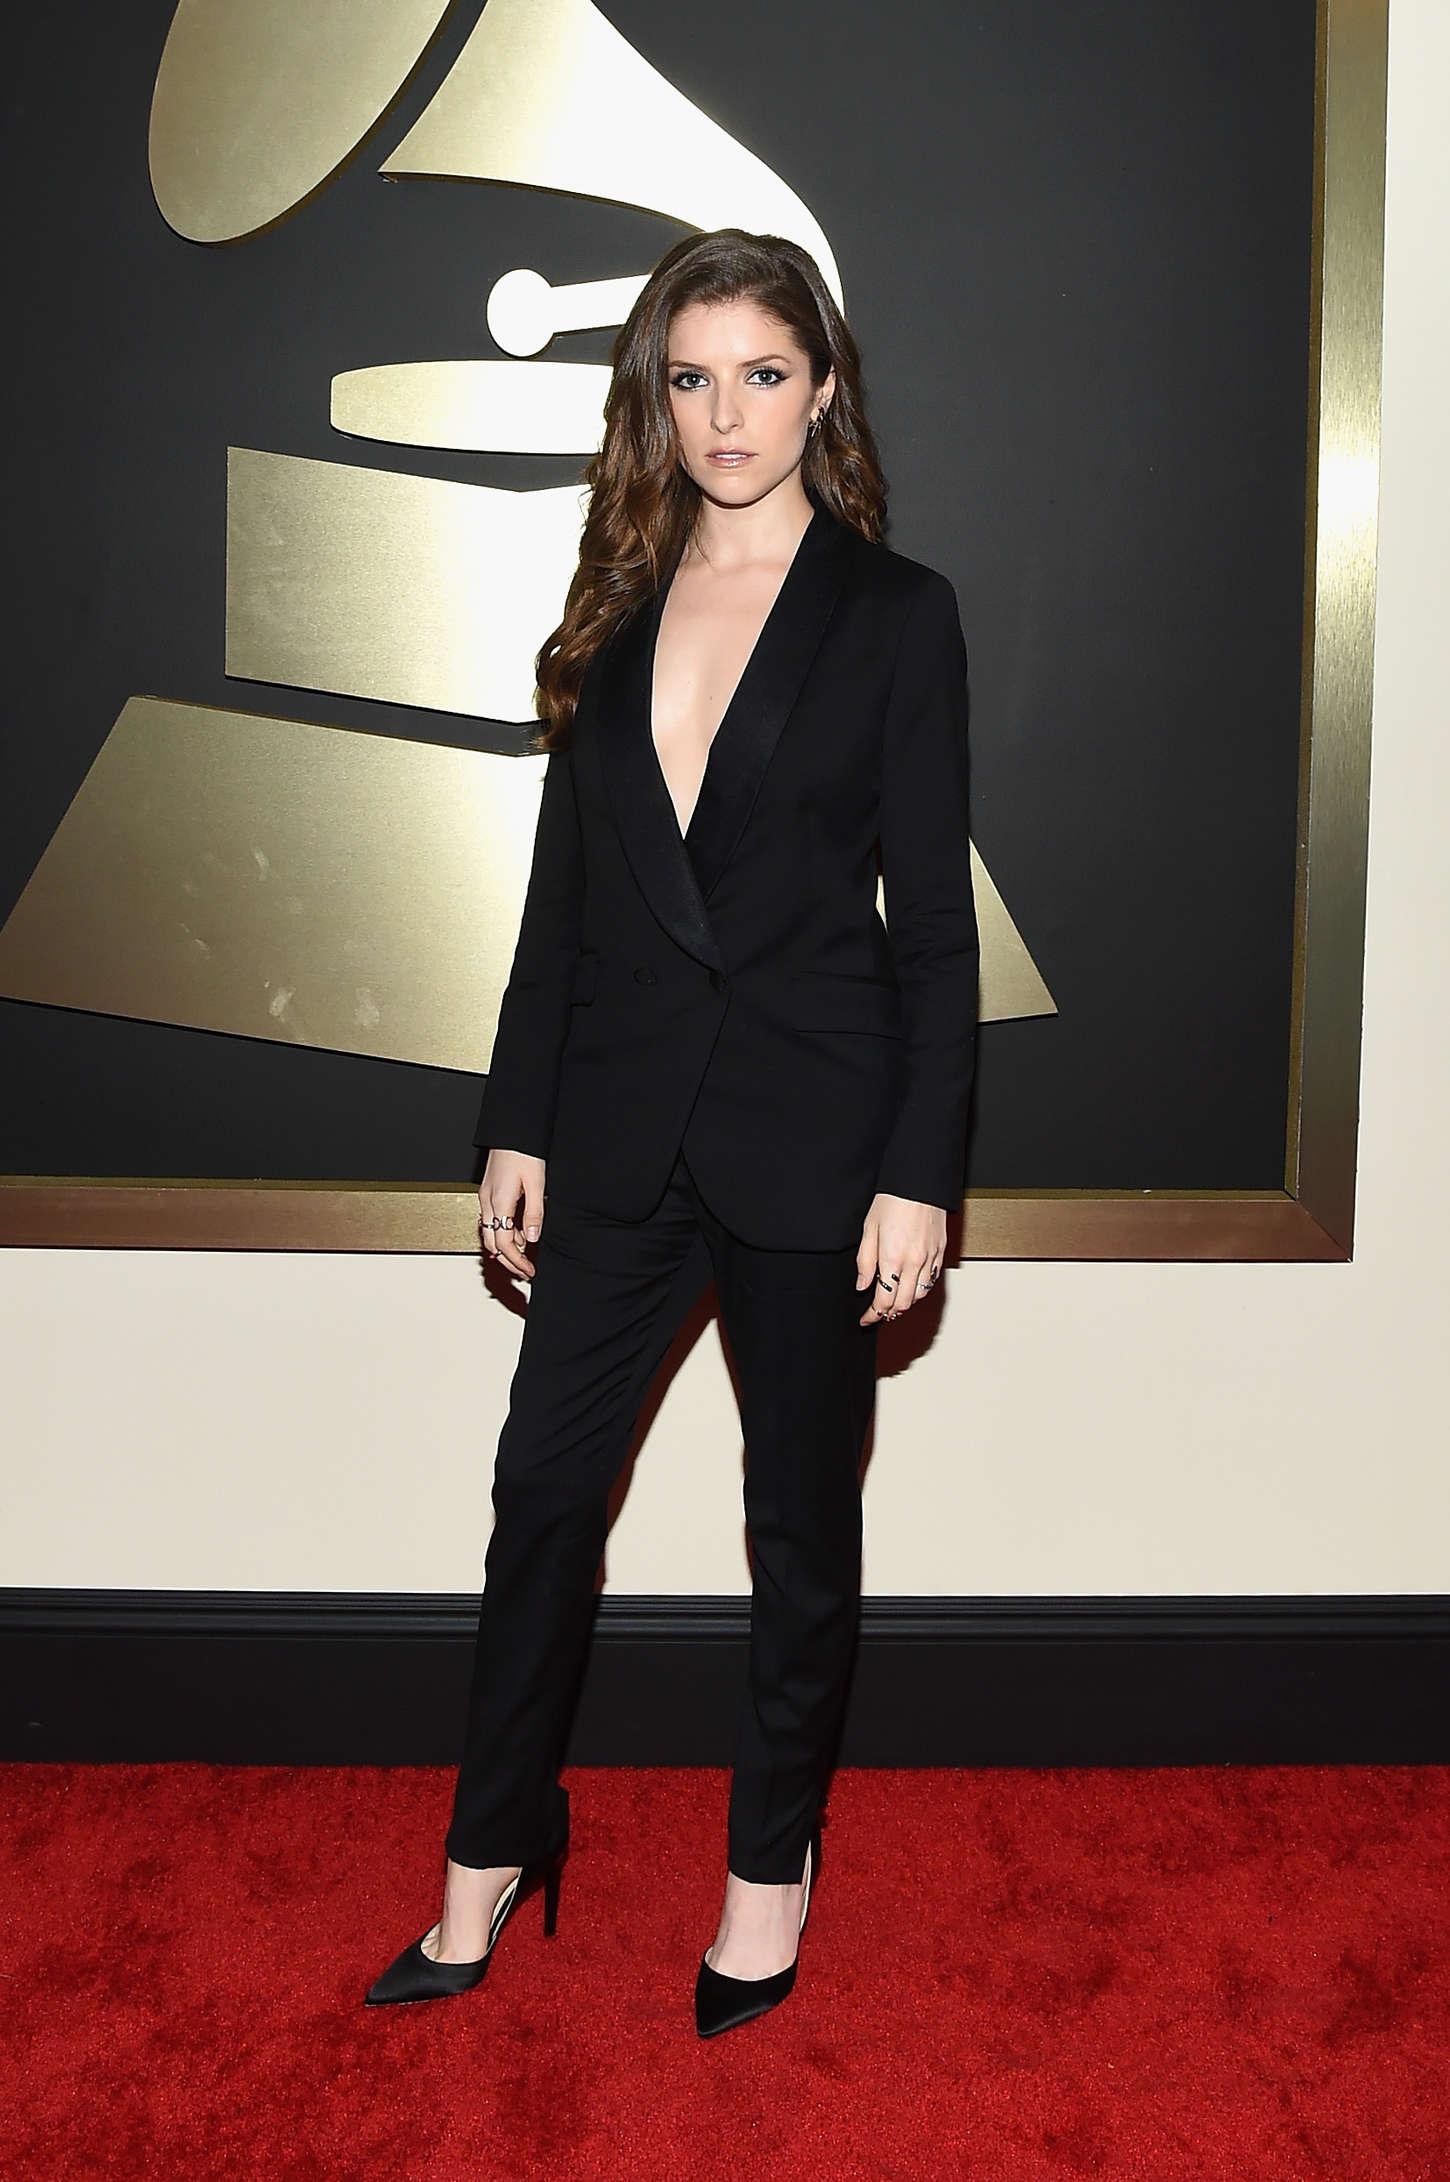 Anna Kendrick 2015 : Anna Kendrick: 2015 GRAMMY Awards -07